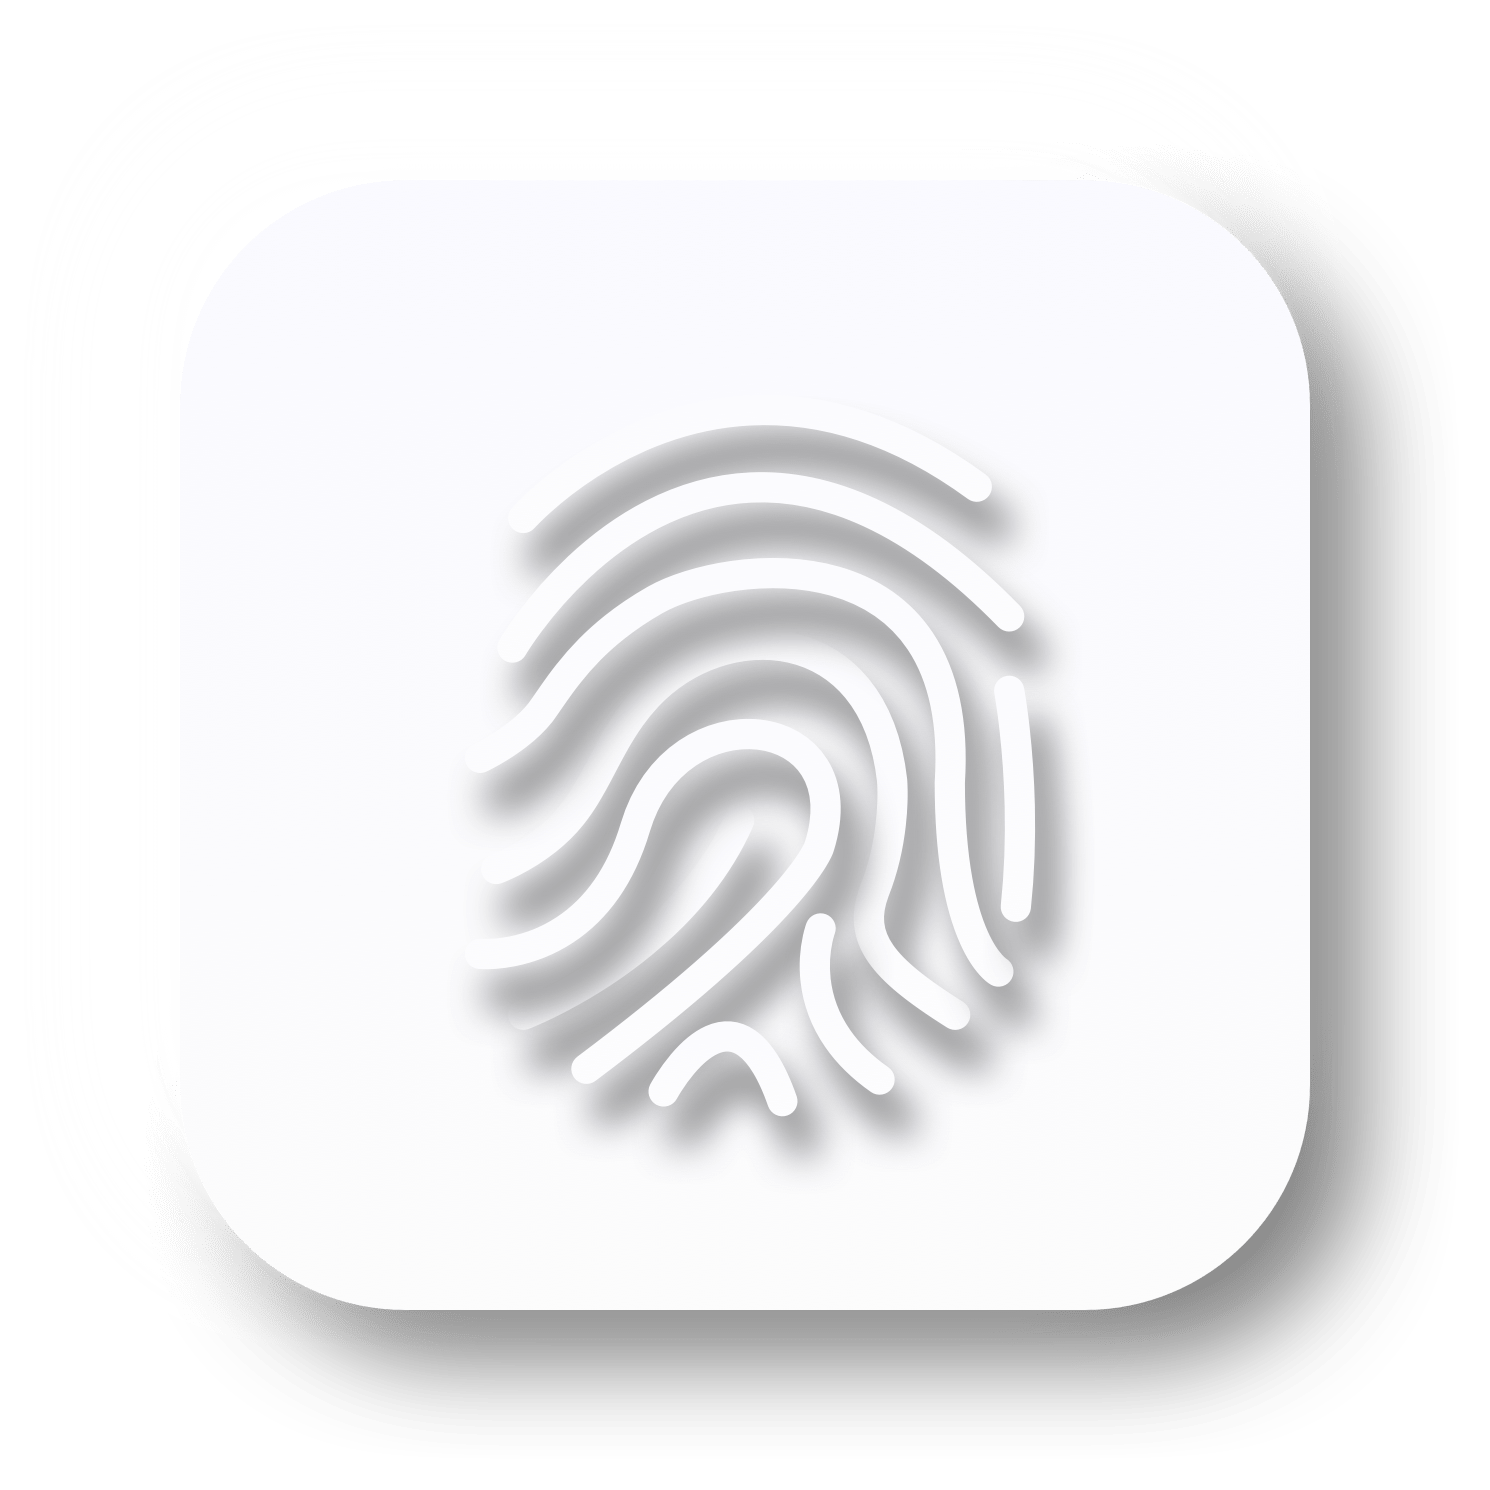 icoon merk identiteit kernwaarden